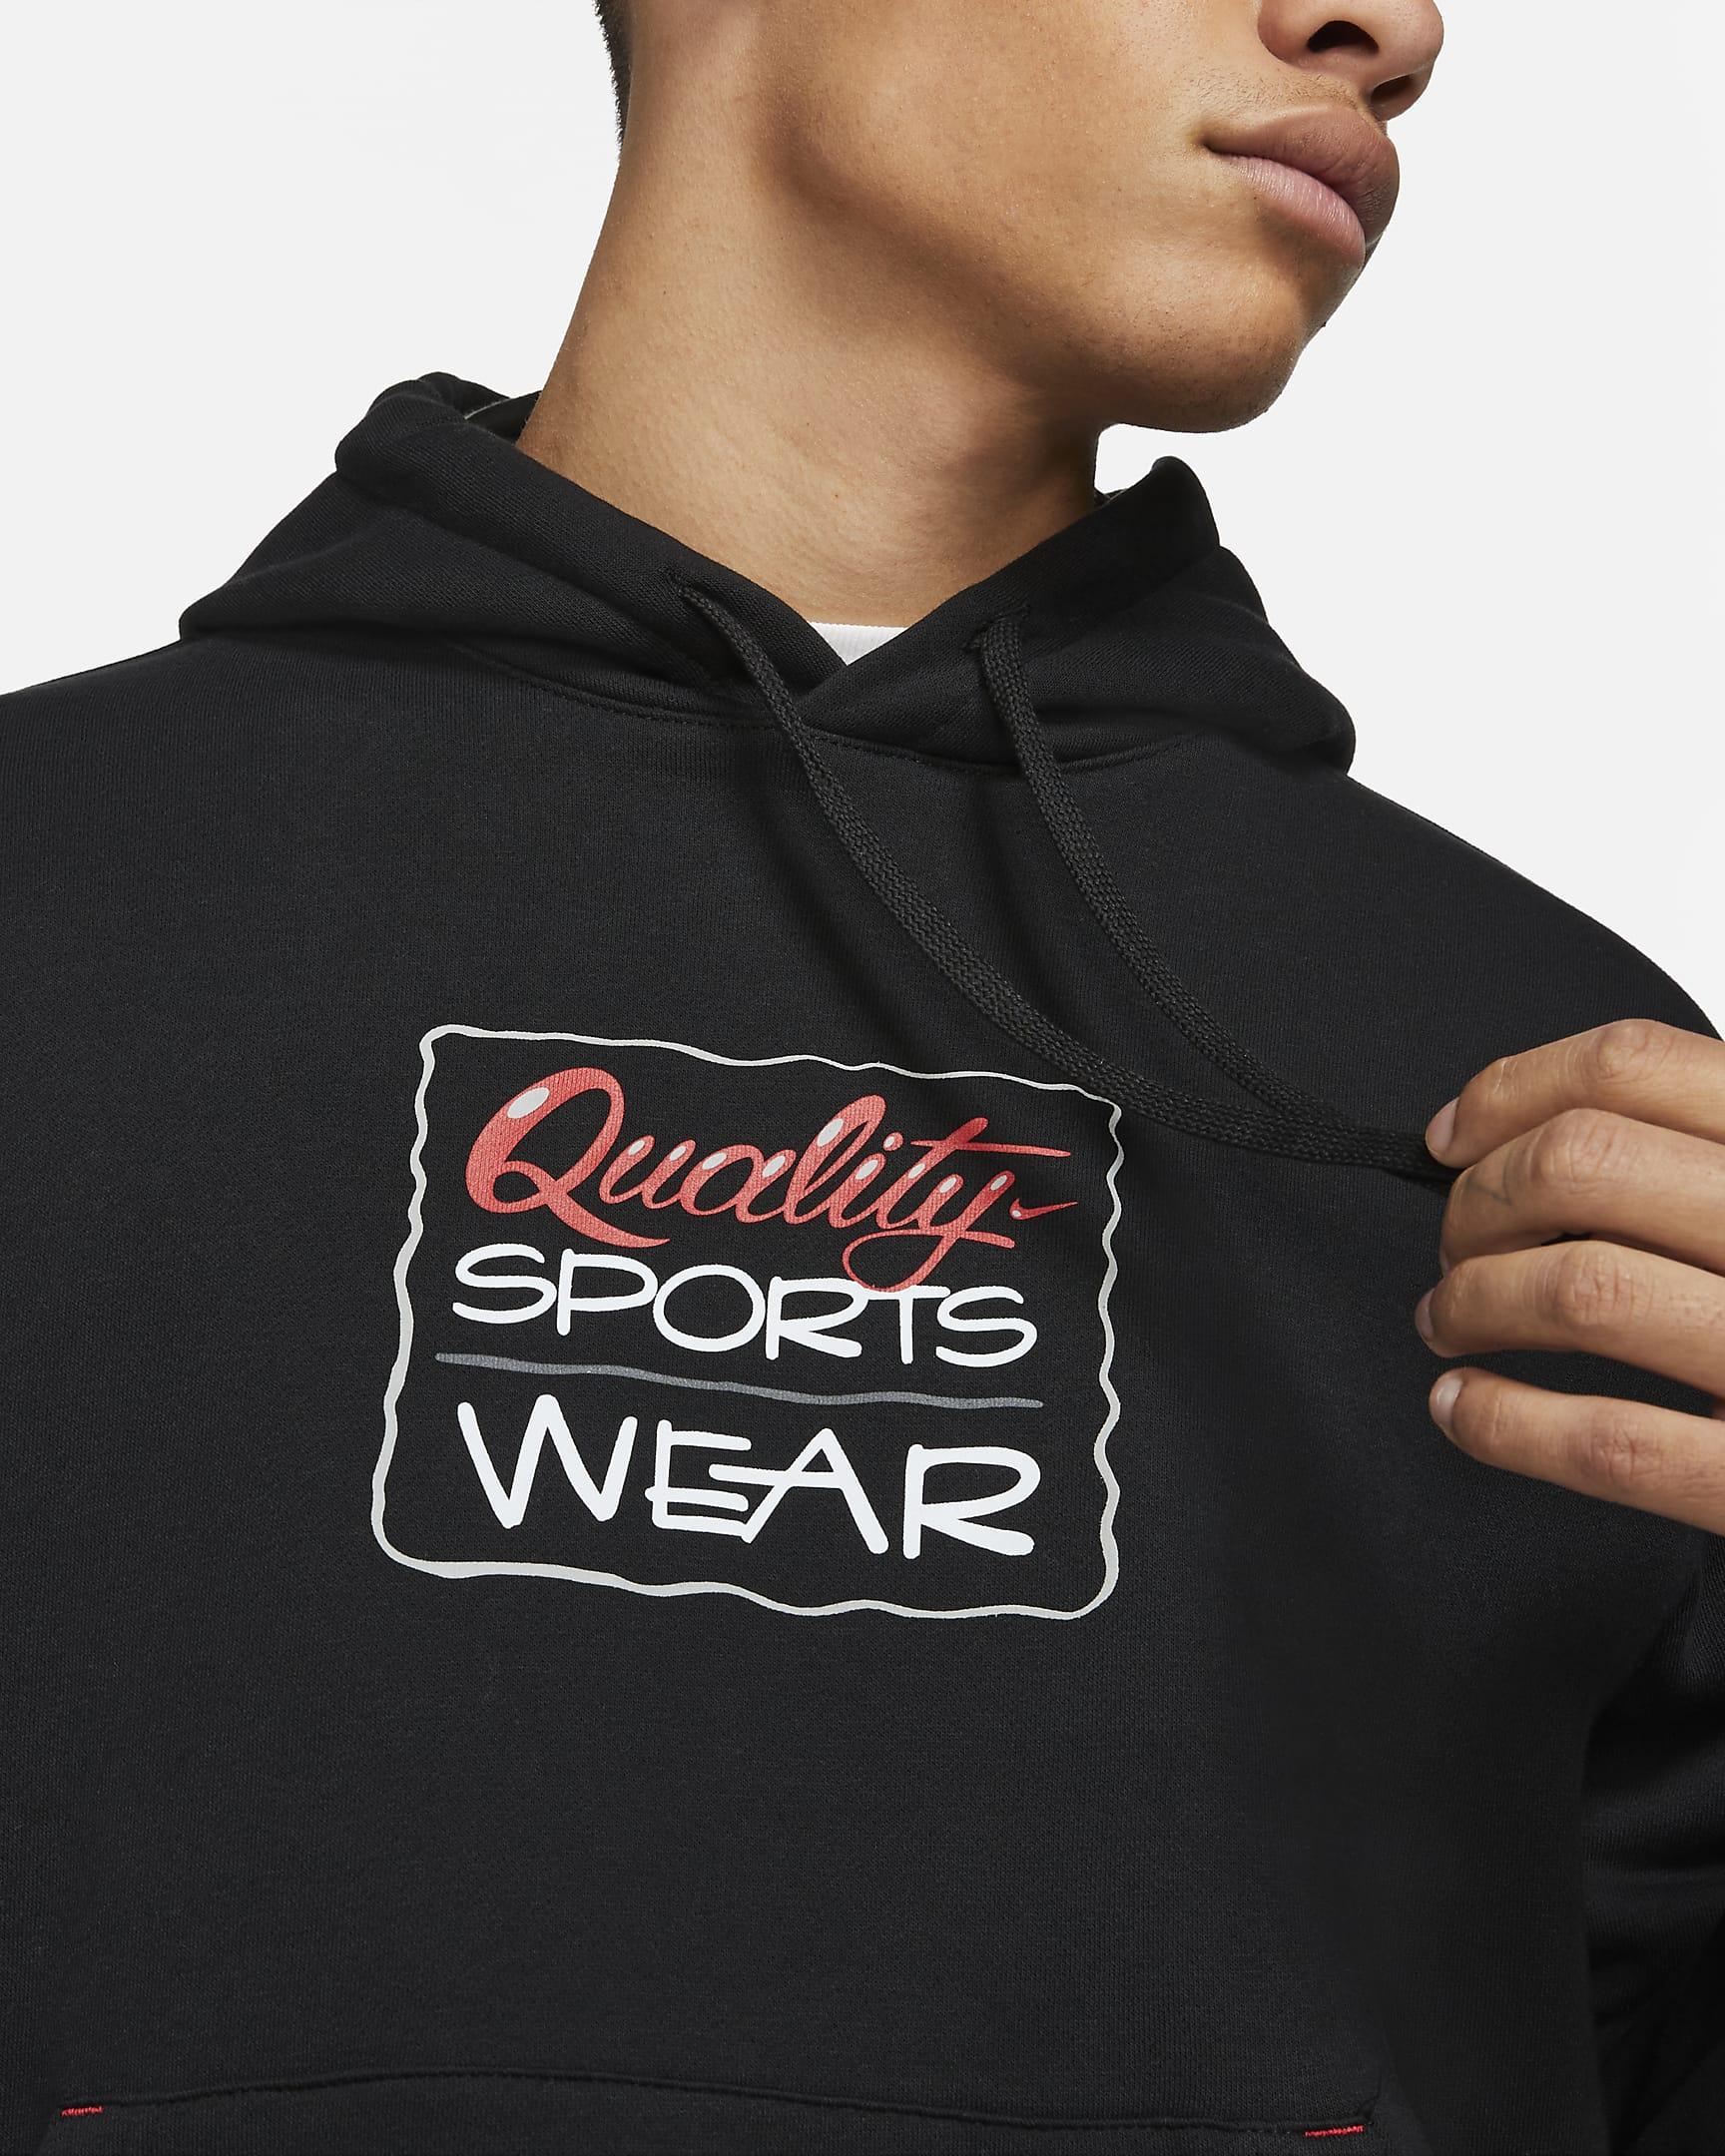 sportswear-club-fleece-mens-pullover-hoodie-cJFN0B-4